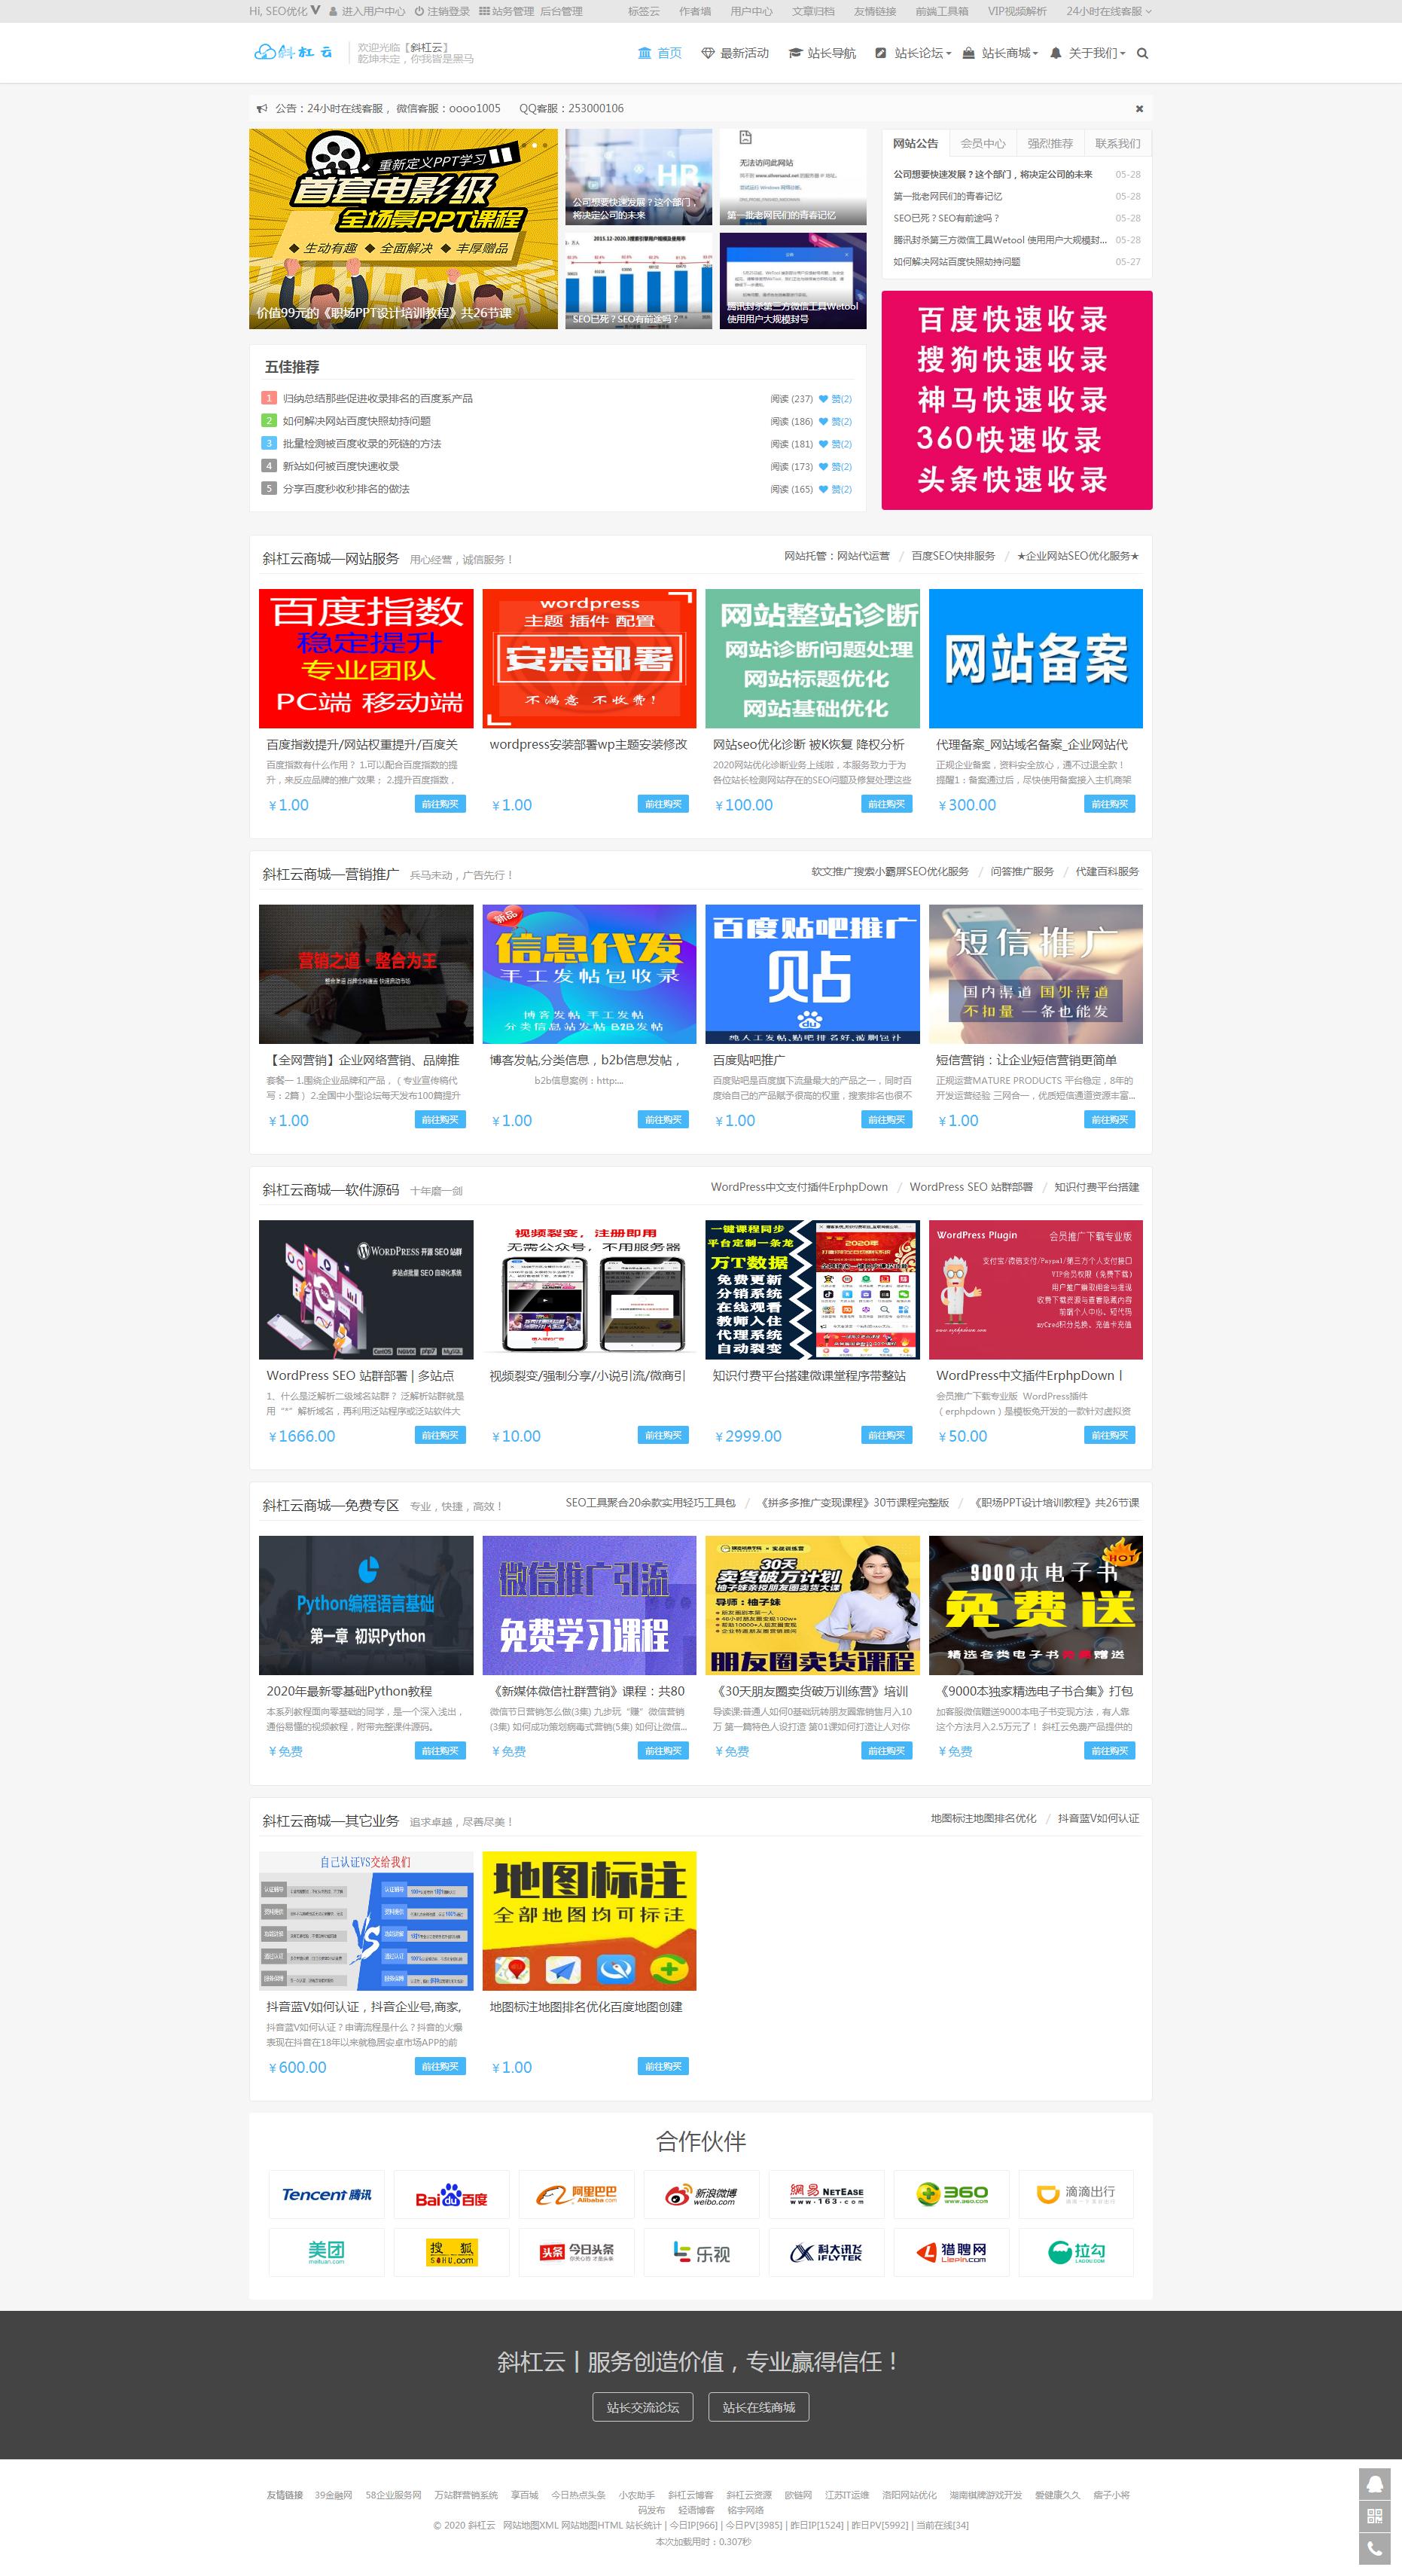 WordPress QUX主题 打造服务业在线商城-轻语博客